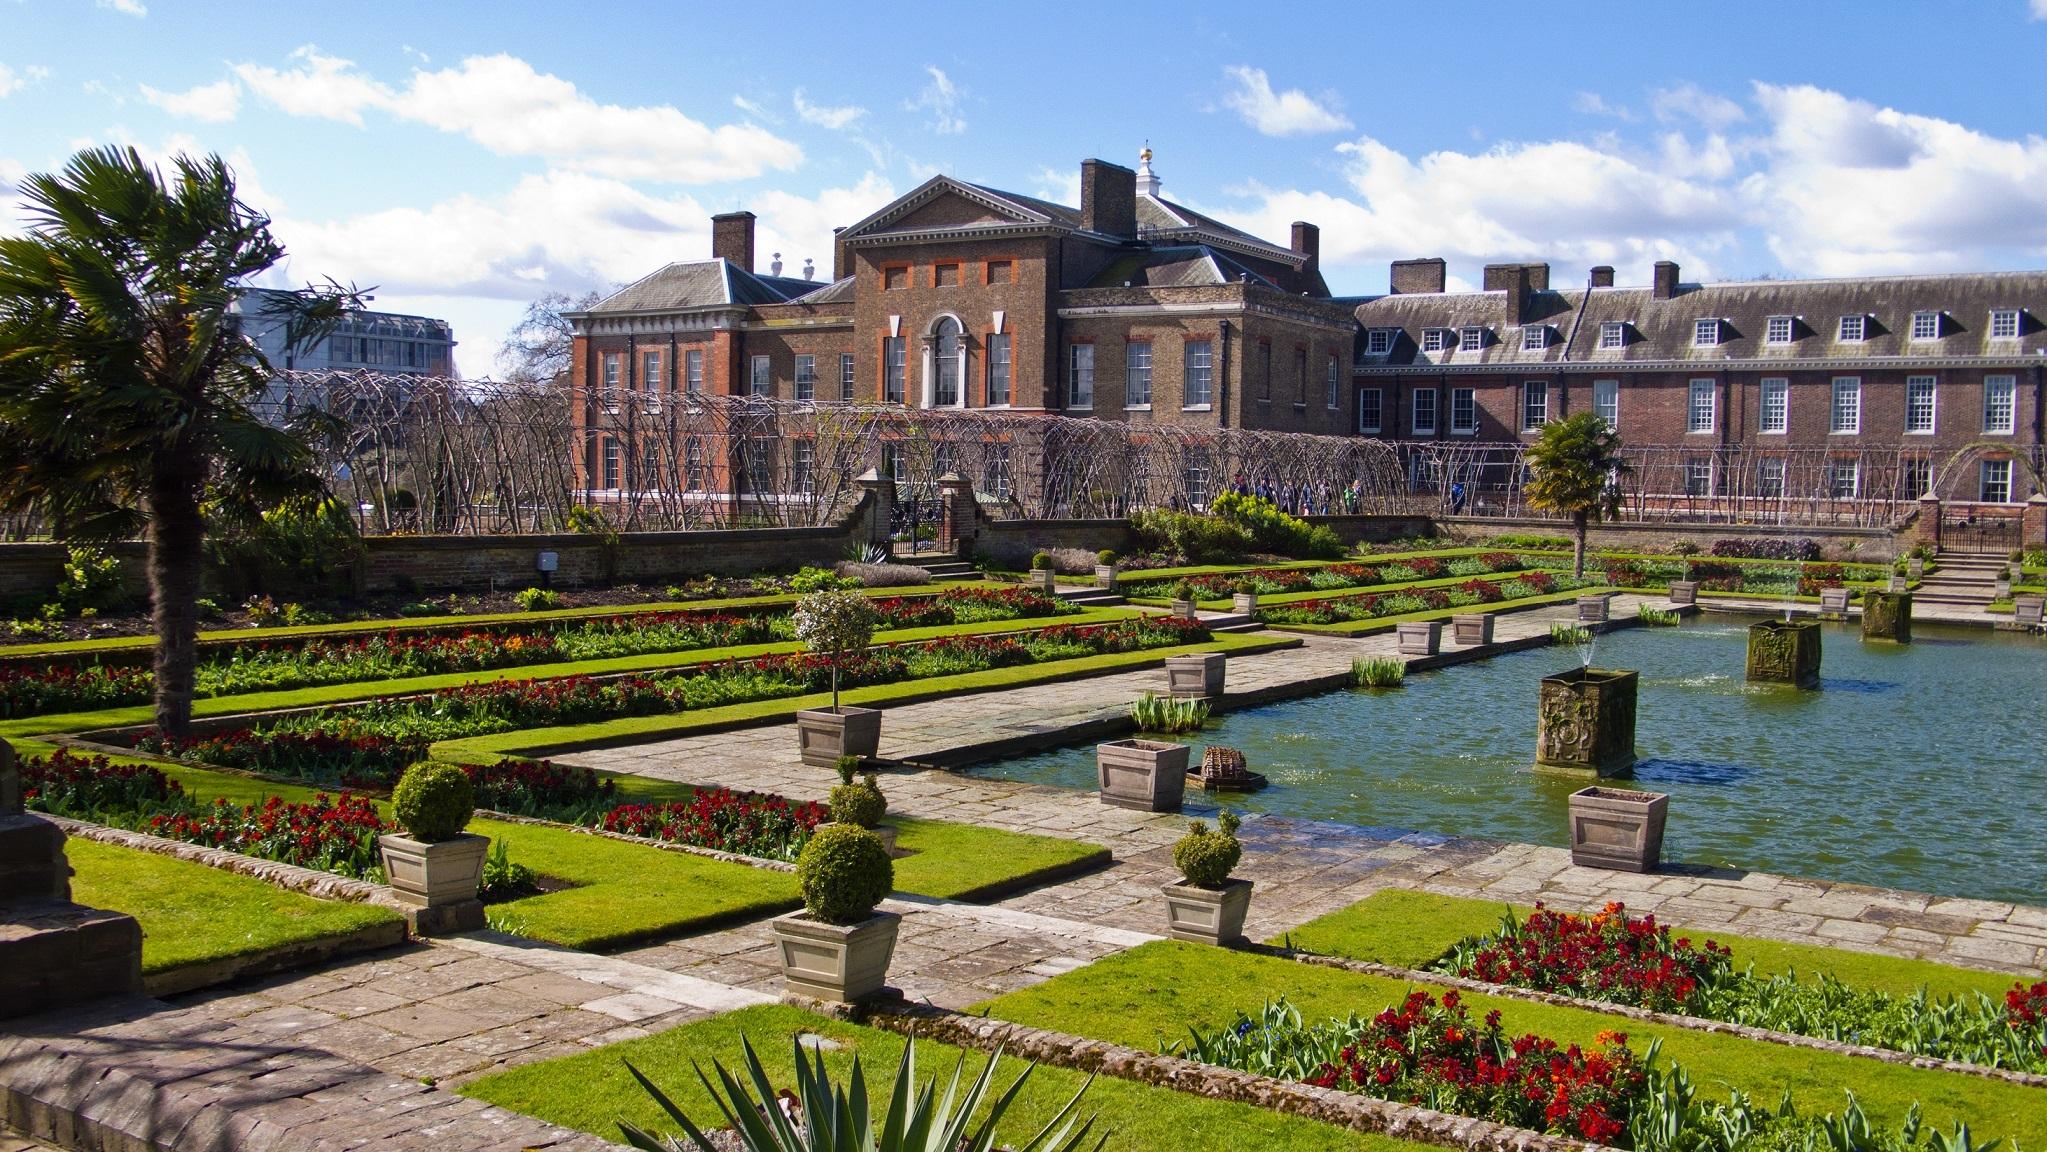 Kensington Palace gardens Photo (C) GETTY